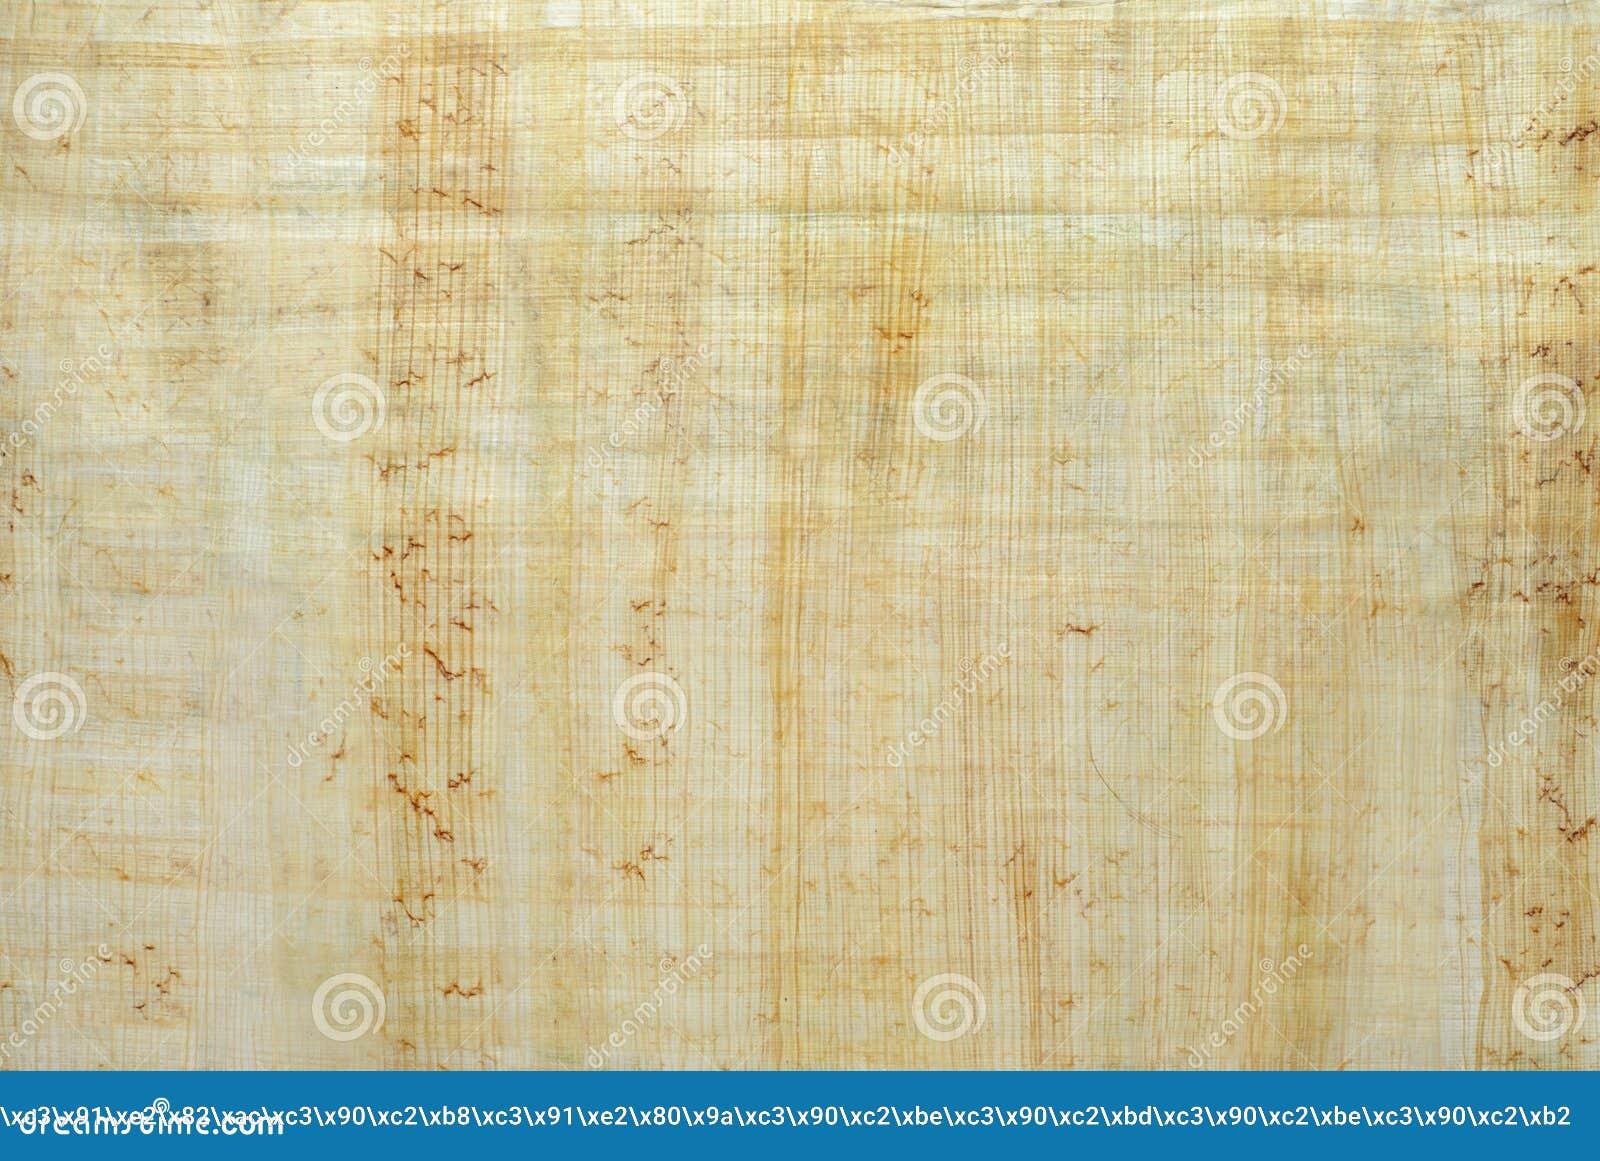 Fondo, textura: superficie del papiro egipcio natural